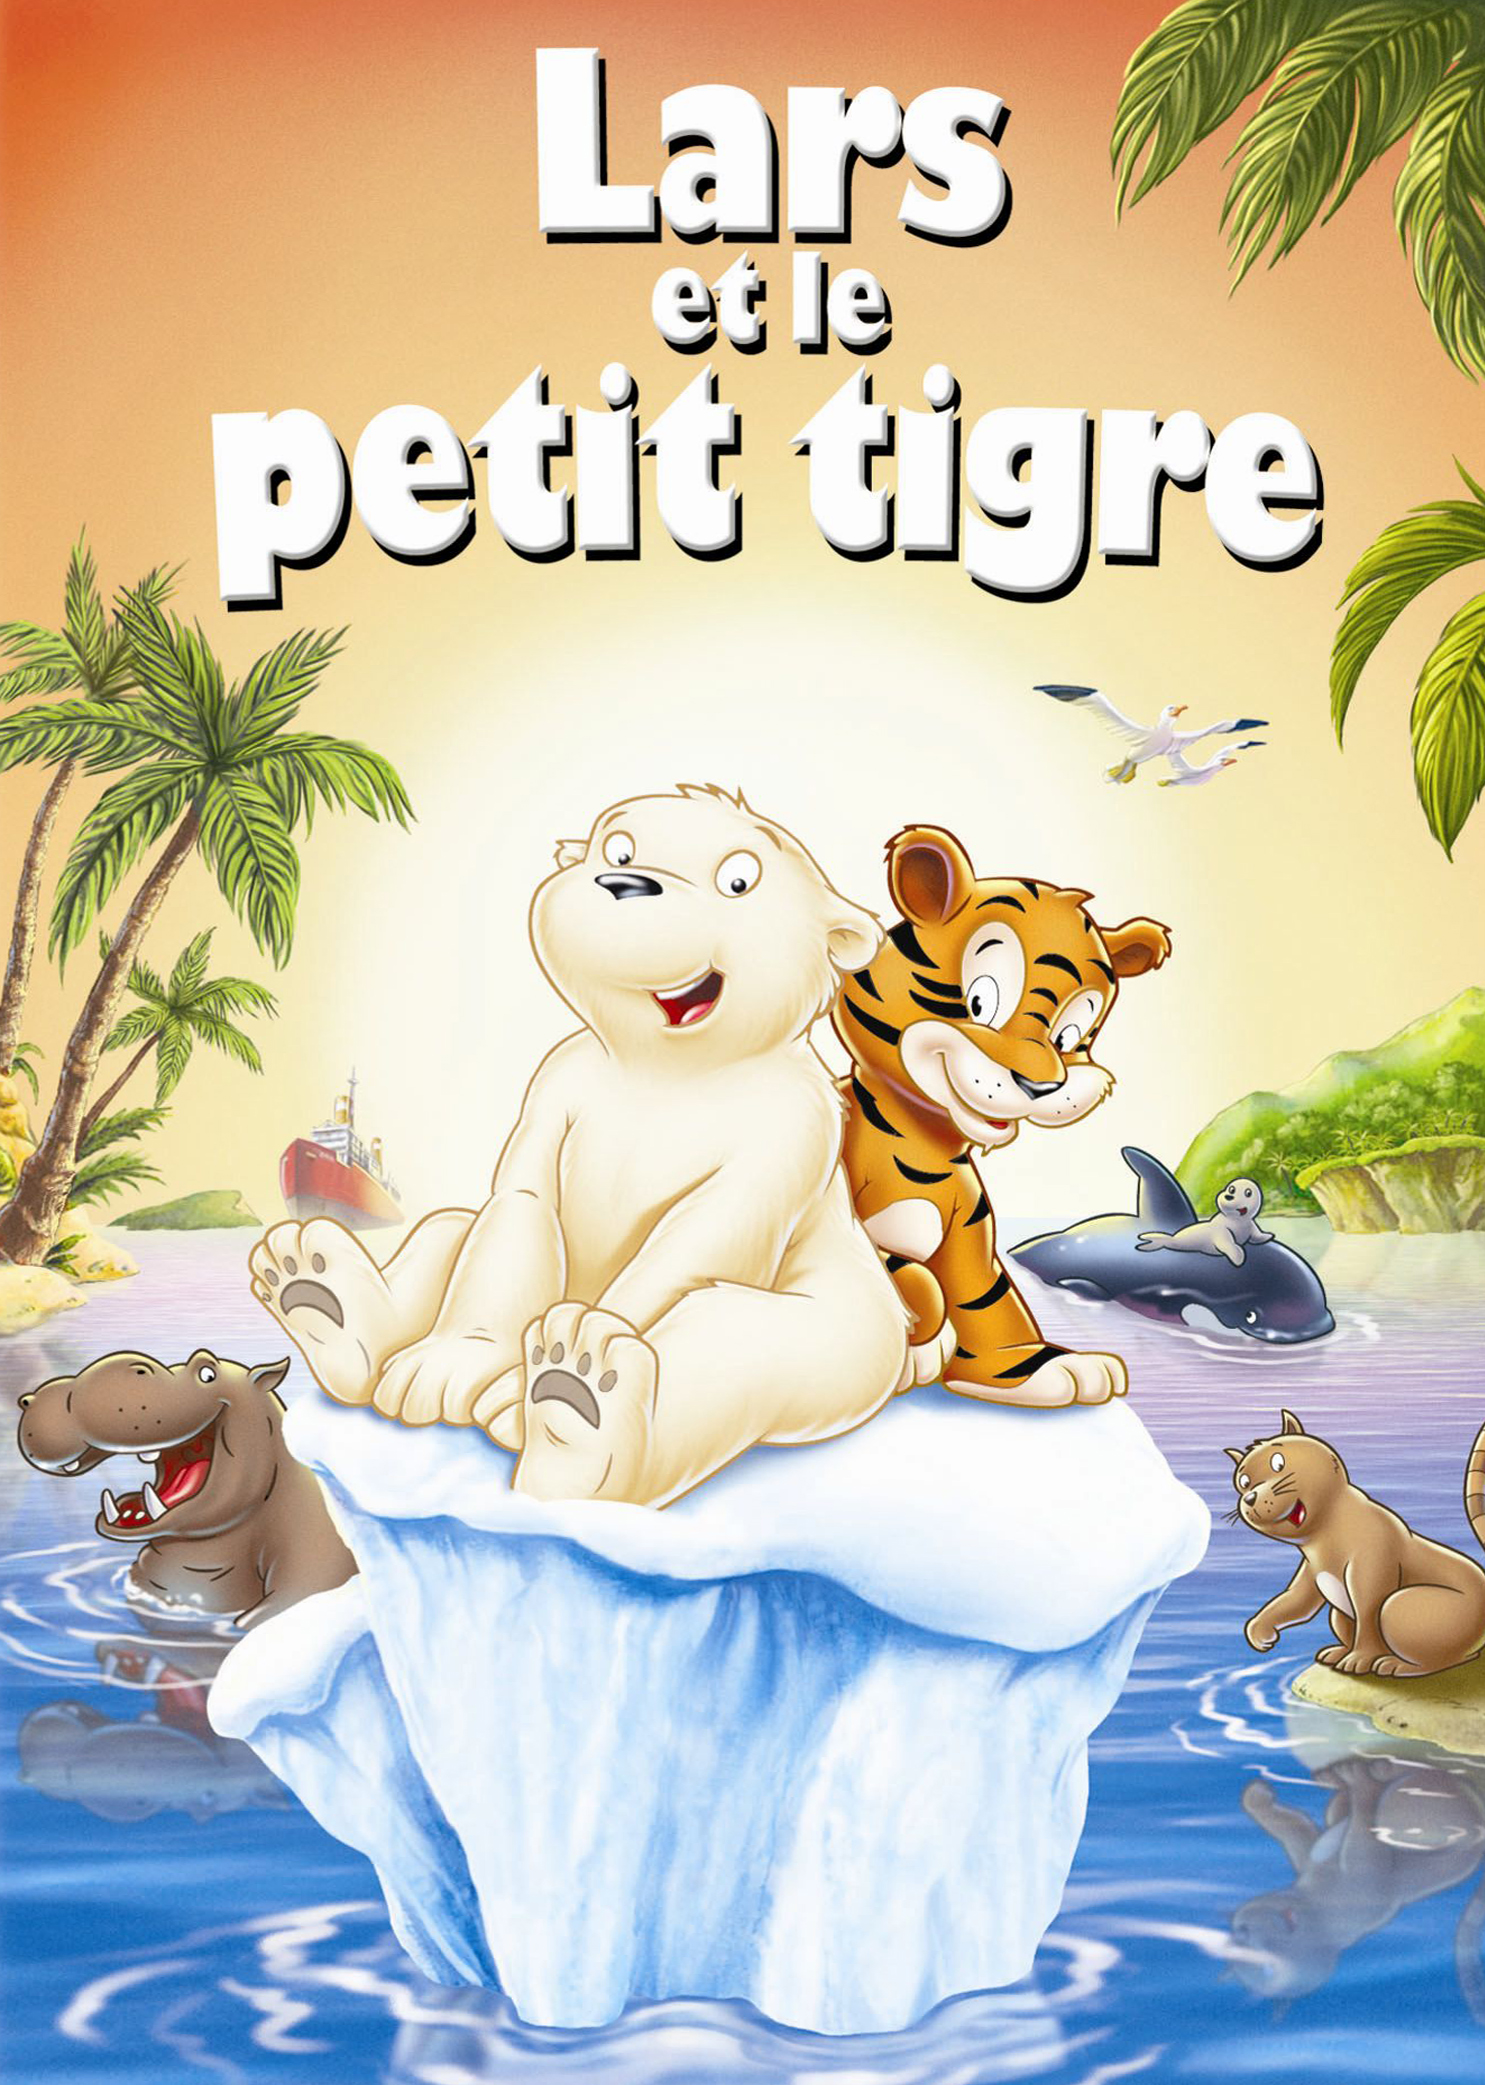 Little Polar Bear: Lars and the Little Tiger